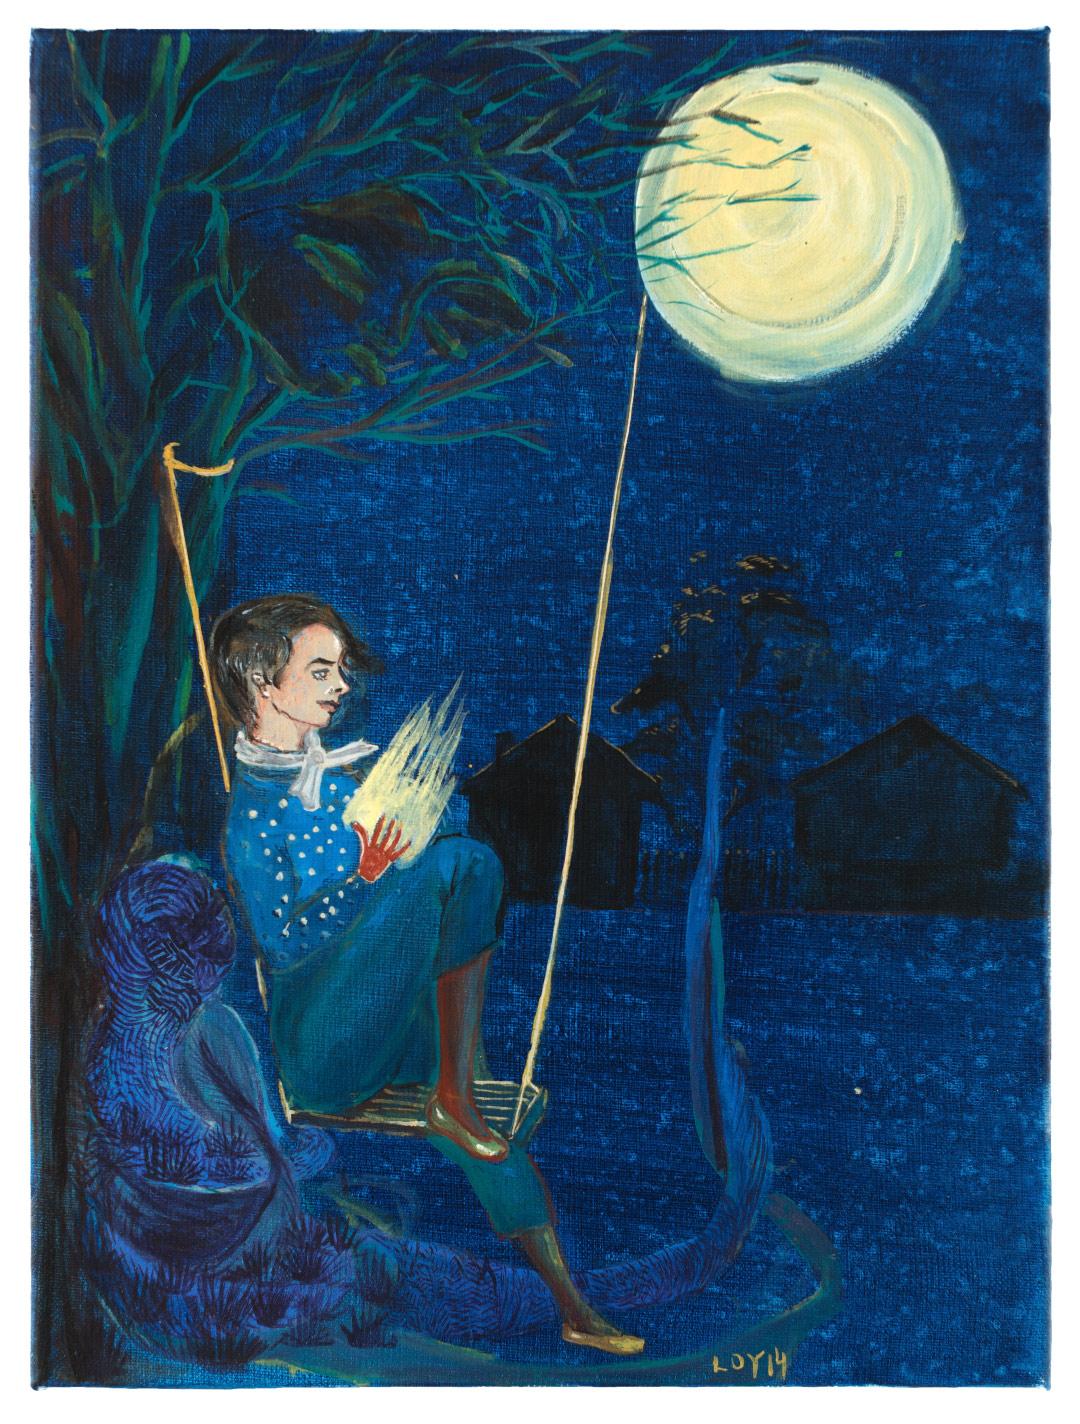 Rosa Loy | Sophies Mondschaukel